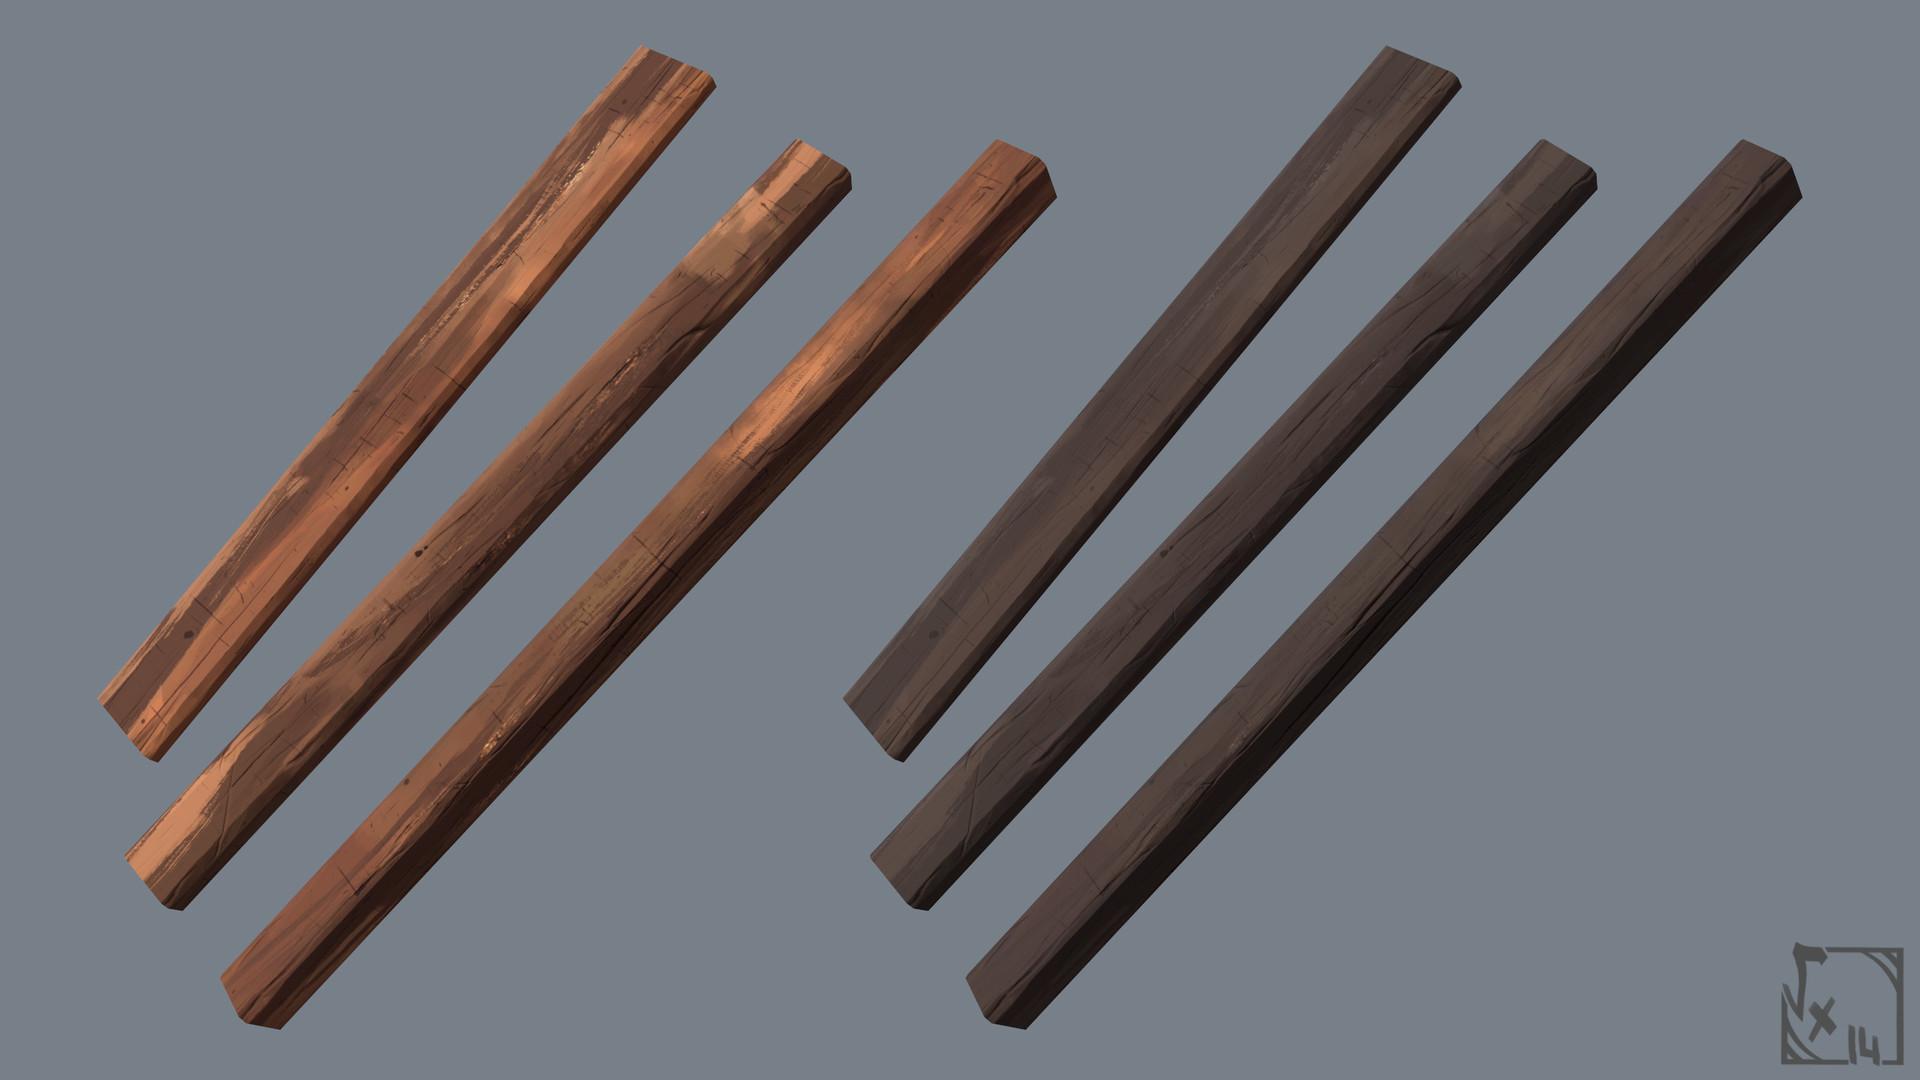 Etienne beschet woodentileableplanks